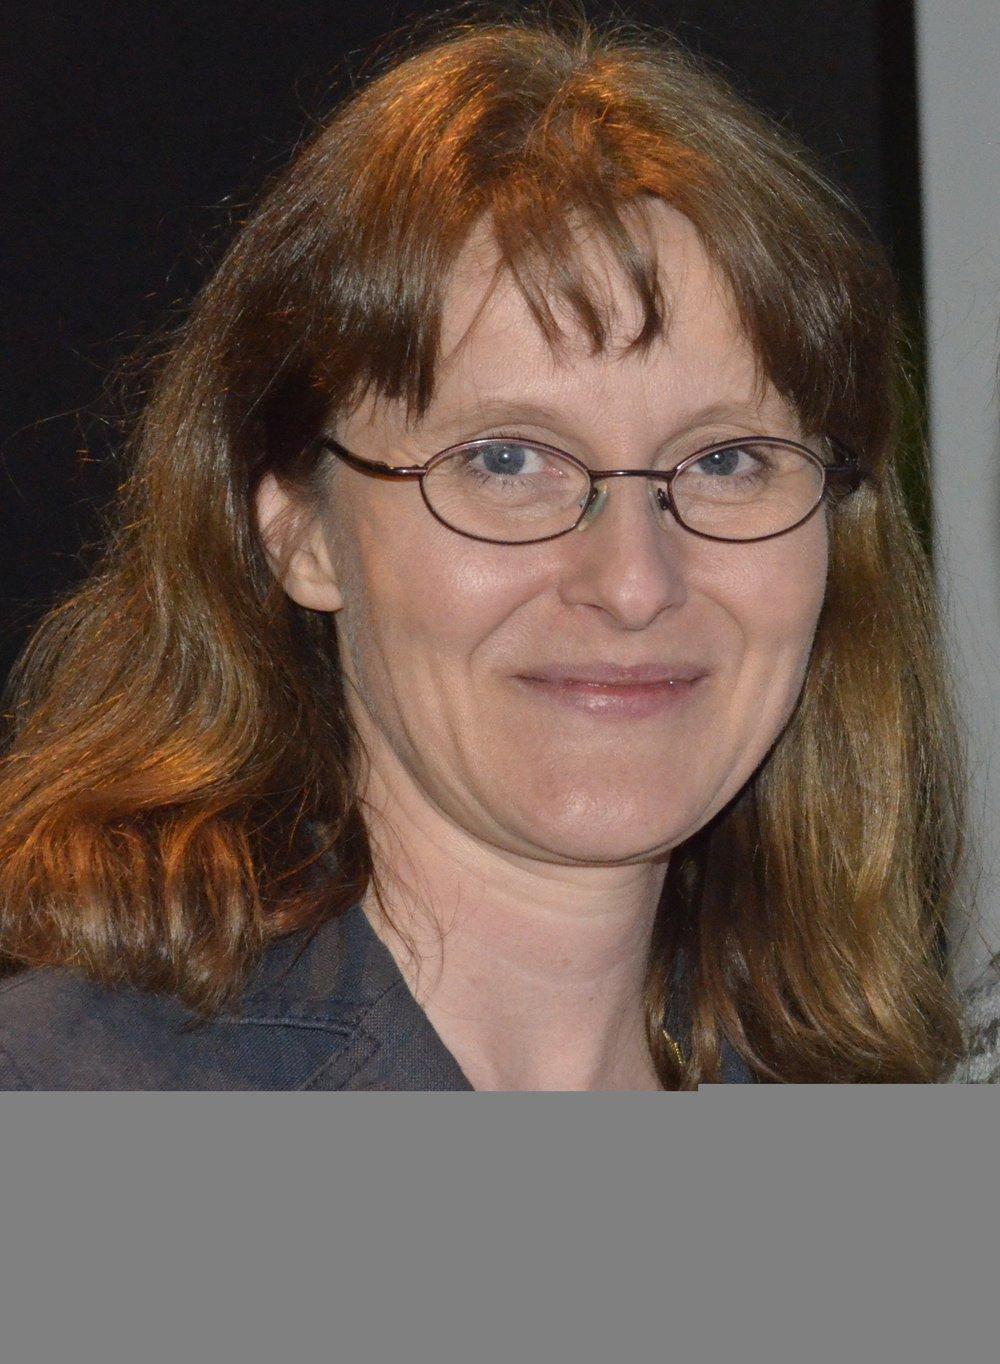 Helena Grennberg, Professor i organisk kemi, Uppsala universitet, ordförande i Svenska Kemisamfundet